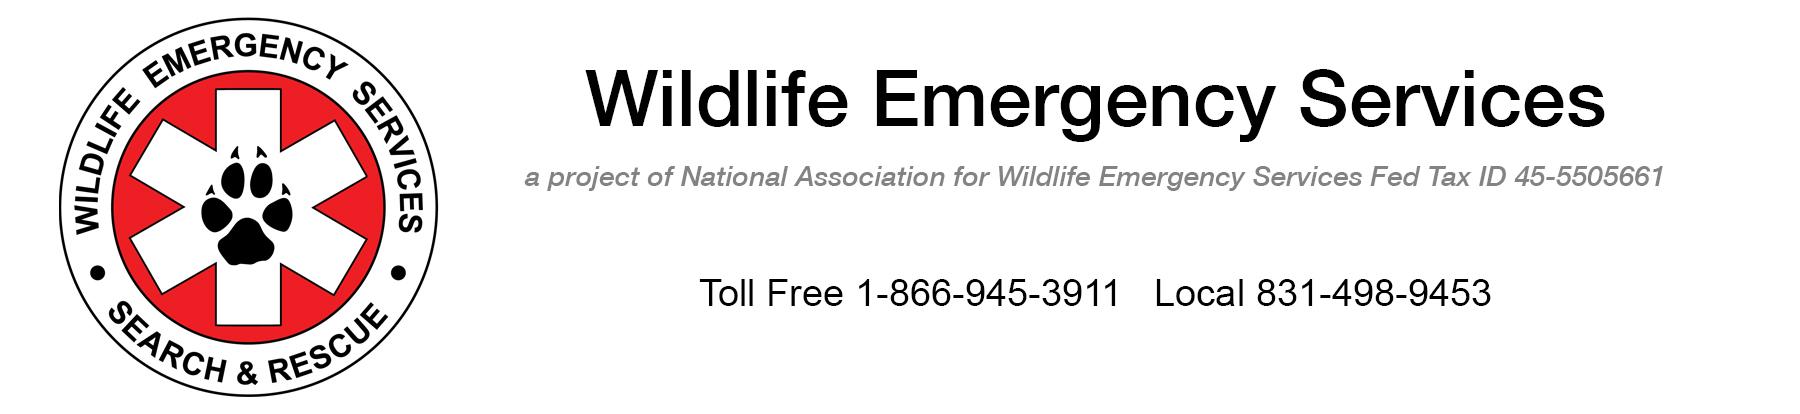 Wildlife Emergency Services